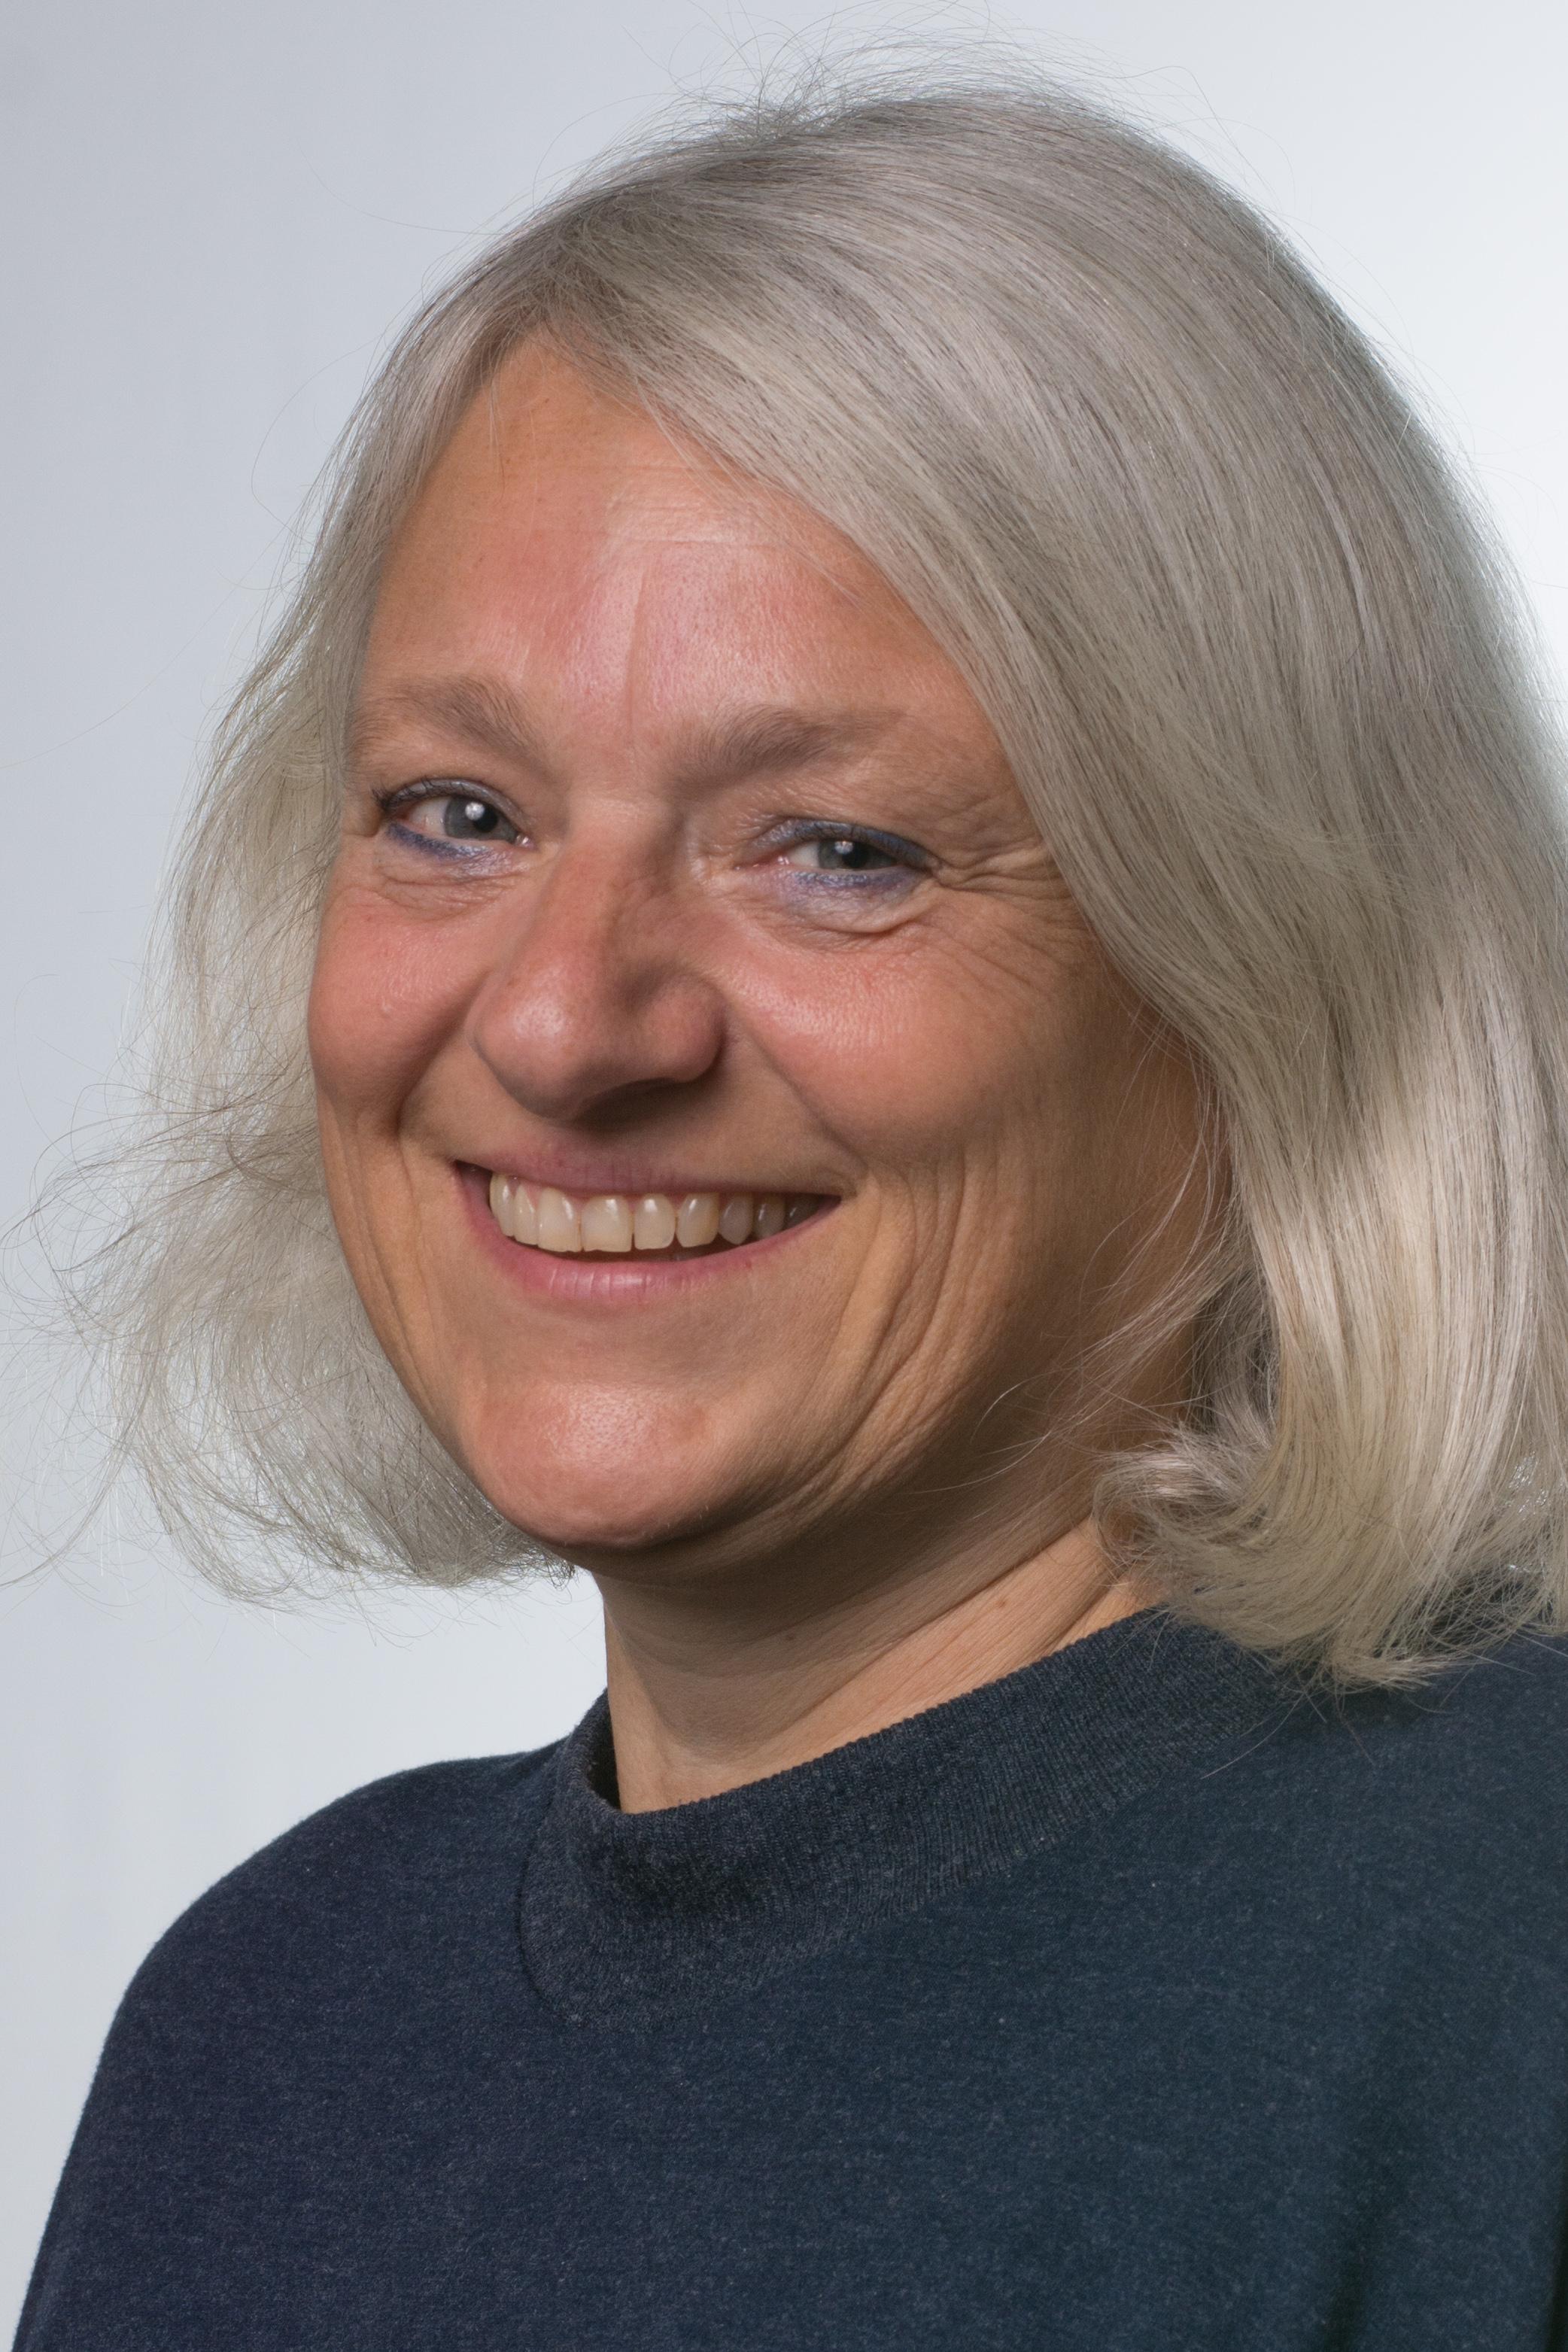 Lizzi Stausgaard